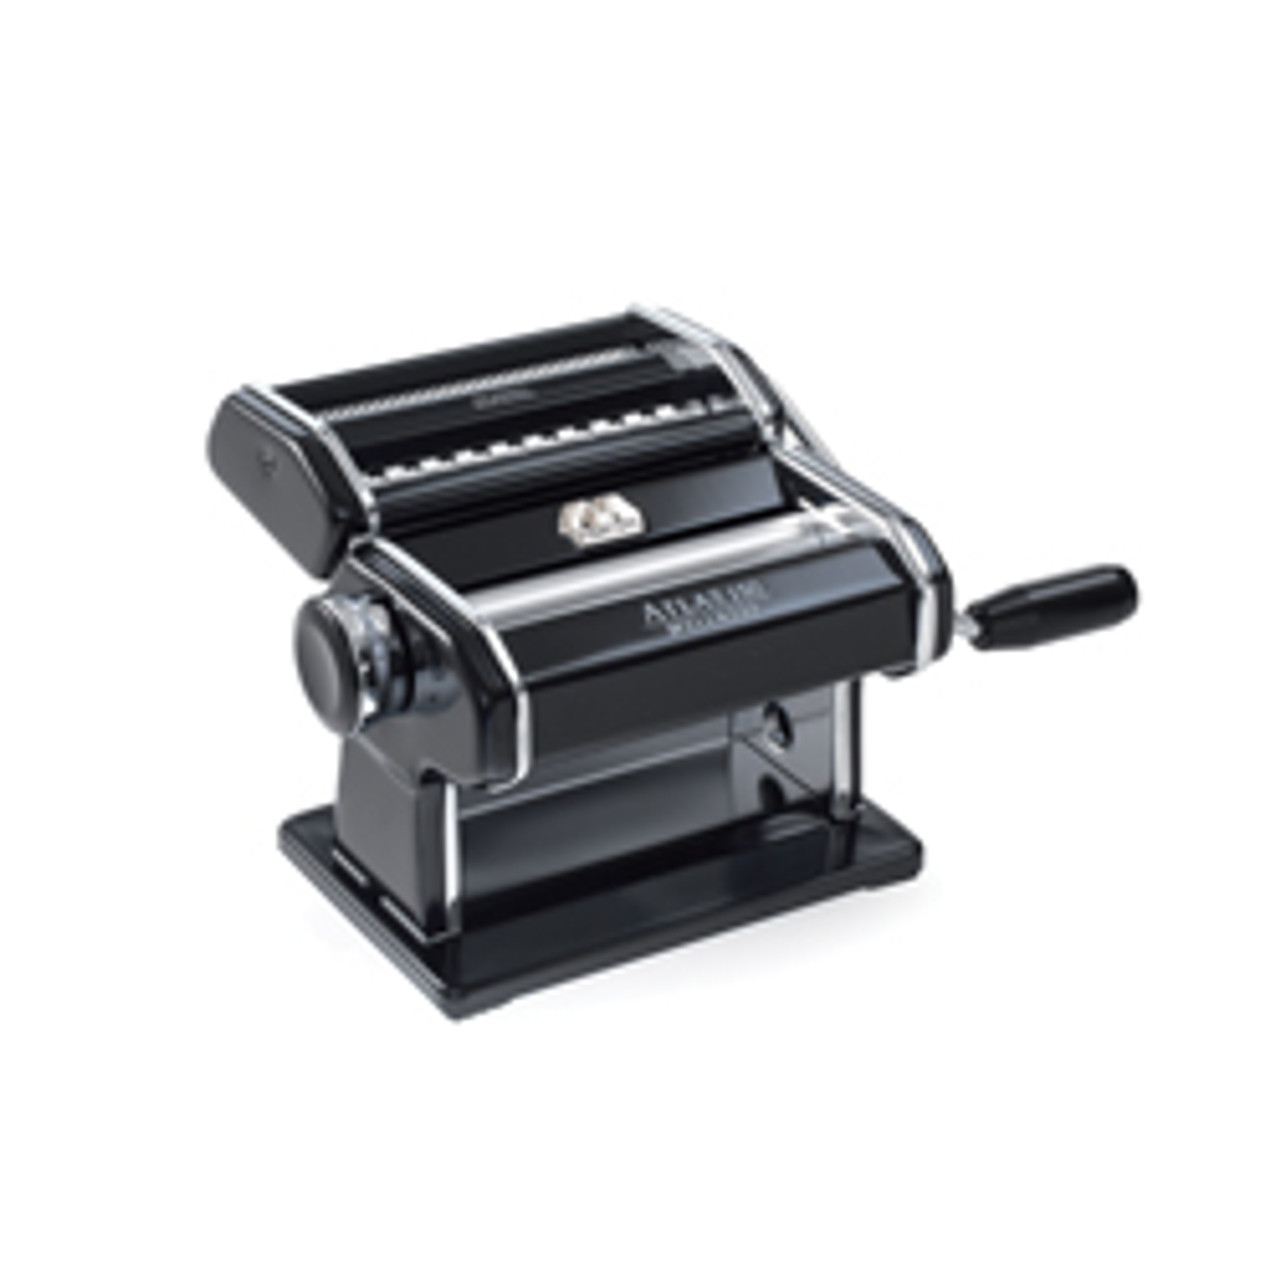 Marcato Atlas Pasta Machine, Black